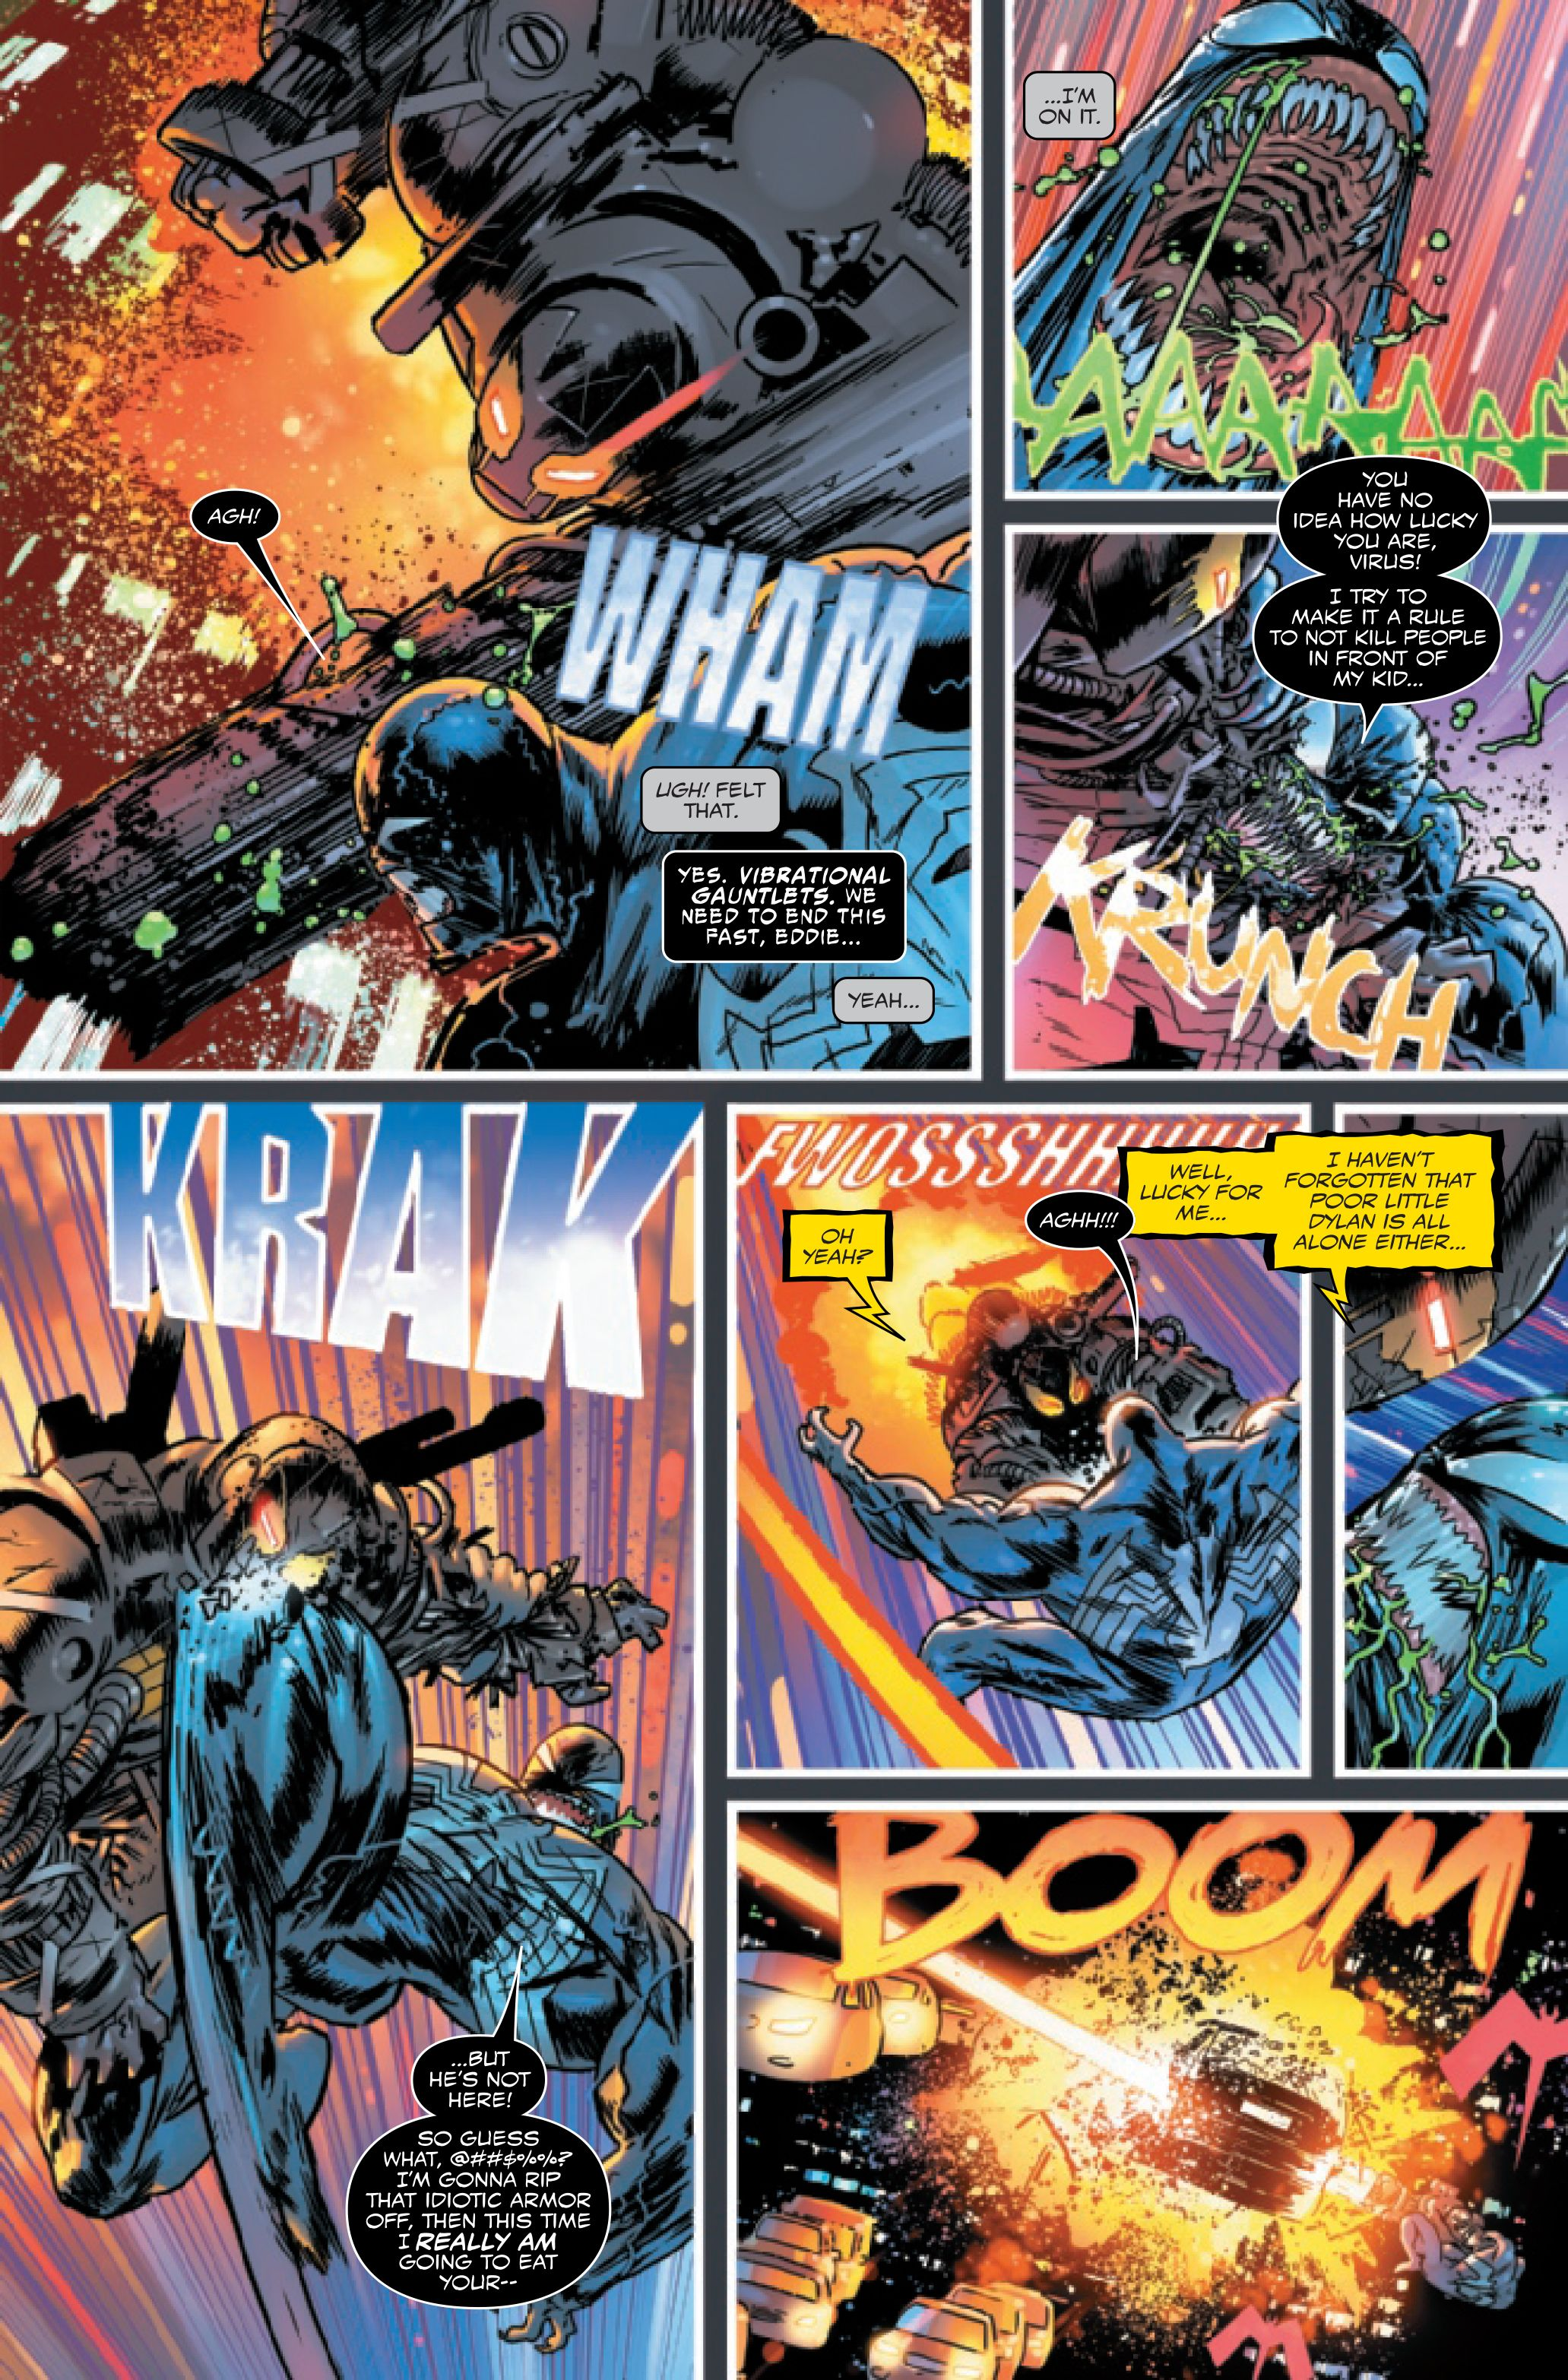 Venom: Simbiote alienígena de Eddie Brock [SPOILER] e Ed pela primeira vez 6